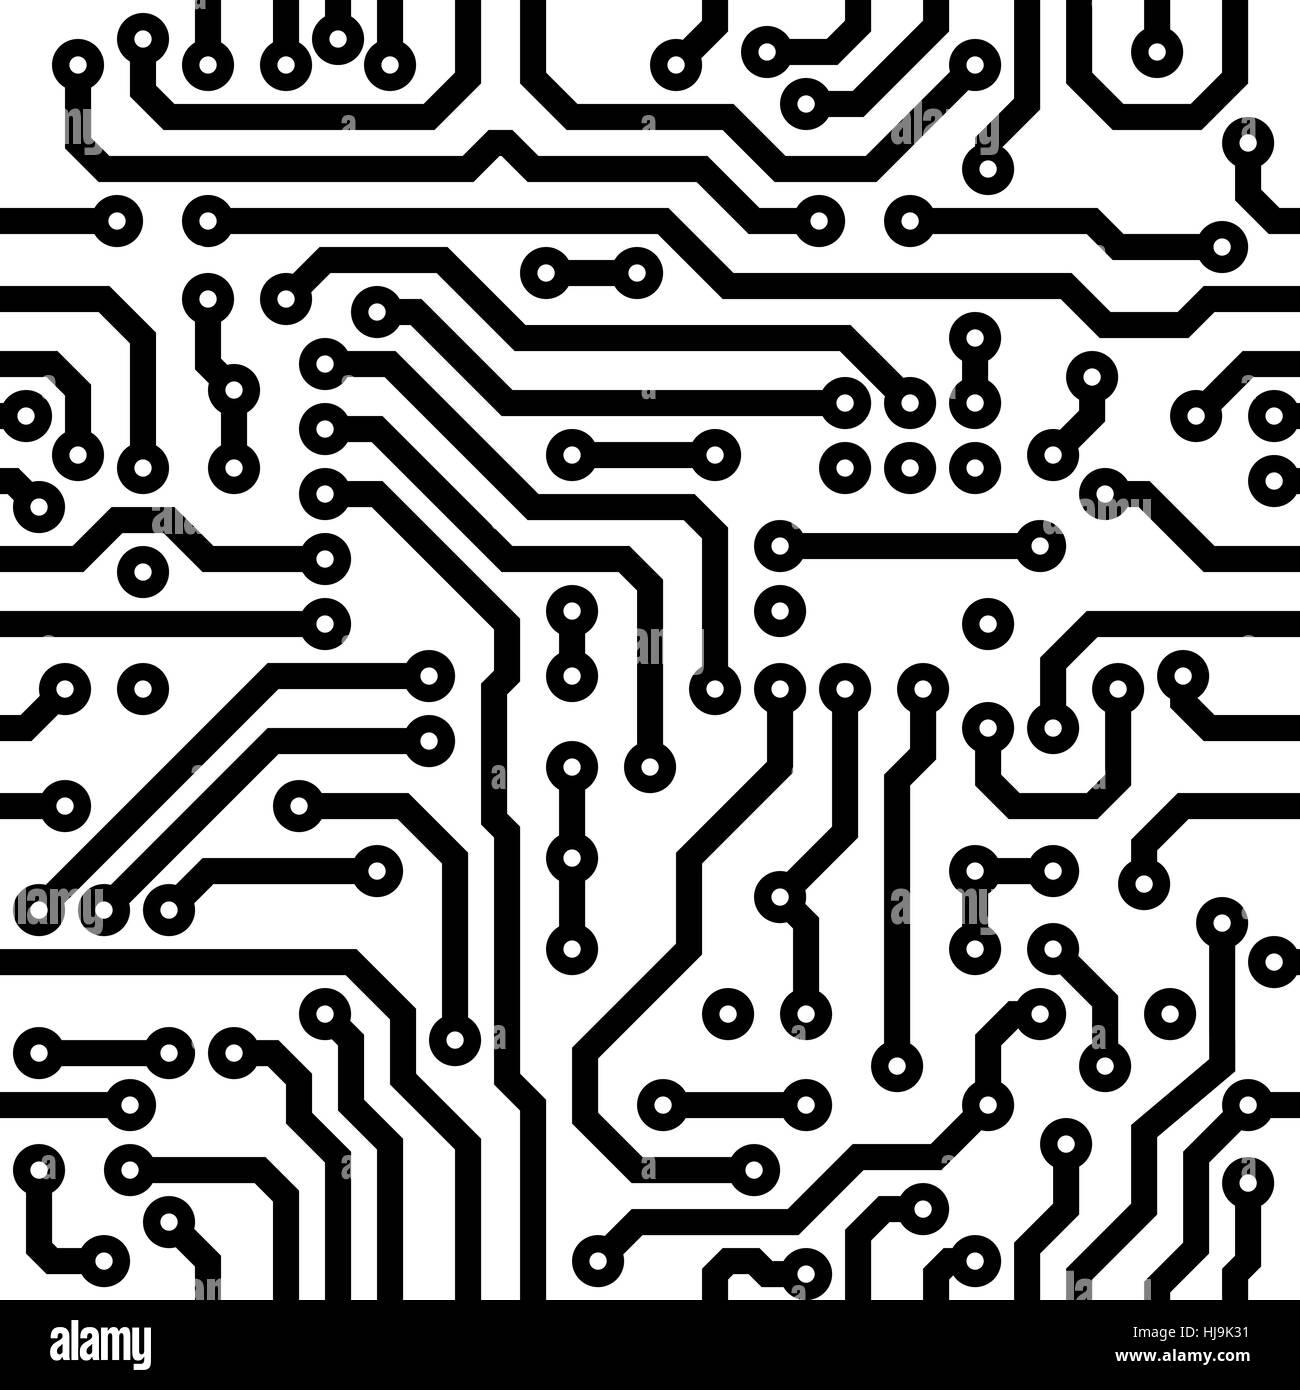 Seamless Texture Circuit Board Monochrome Stock Photos & Seamless ...